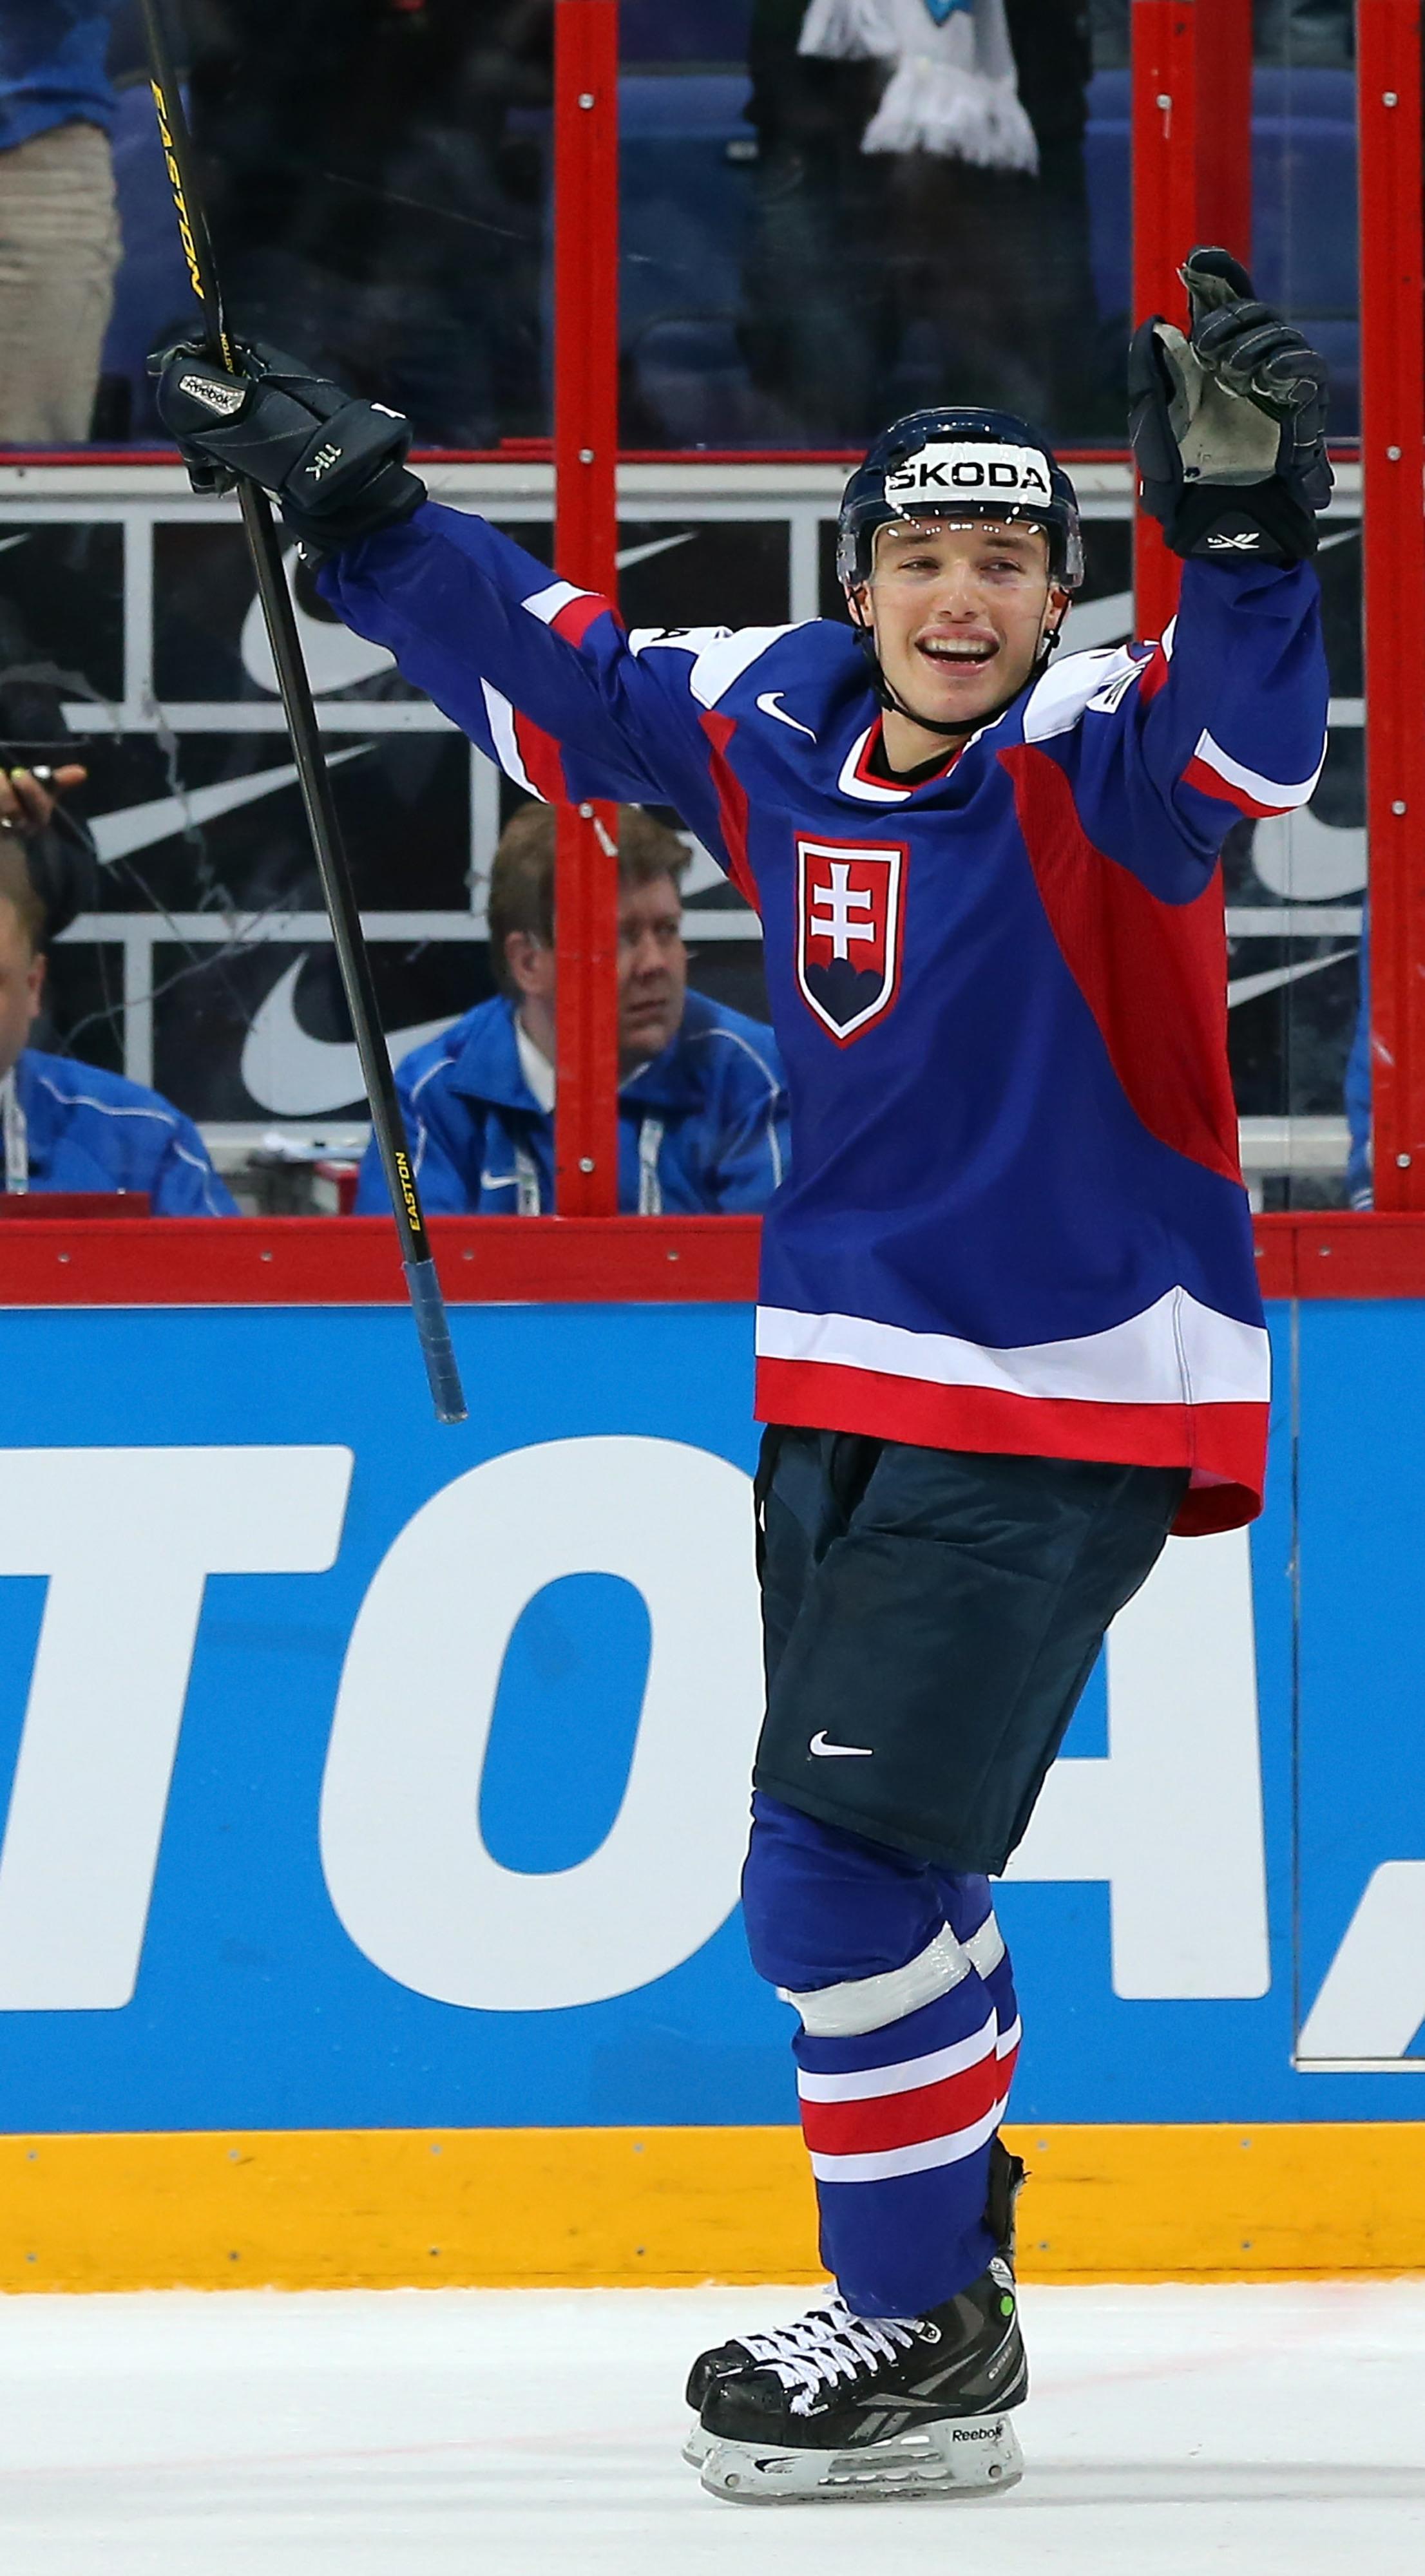 """Yay, Slovakia!"" Marko said (maybe)."